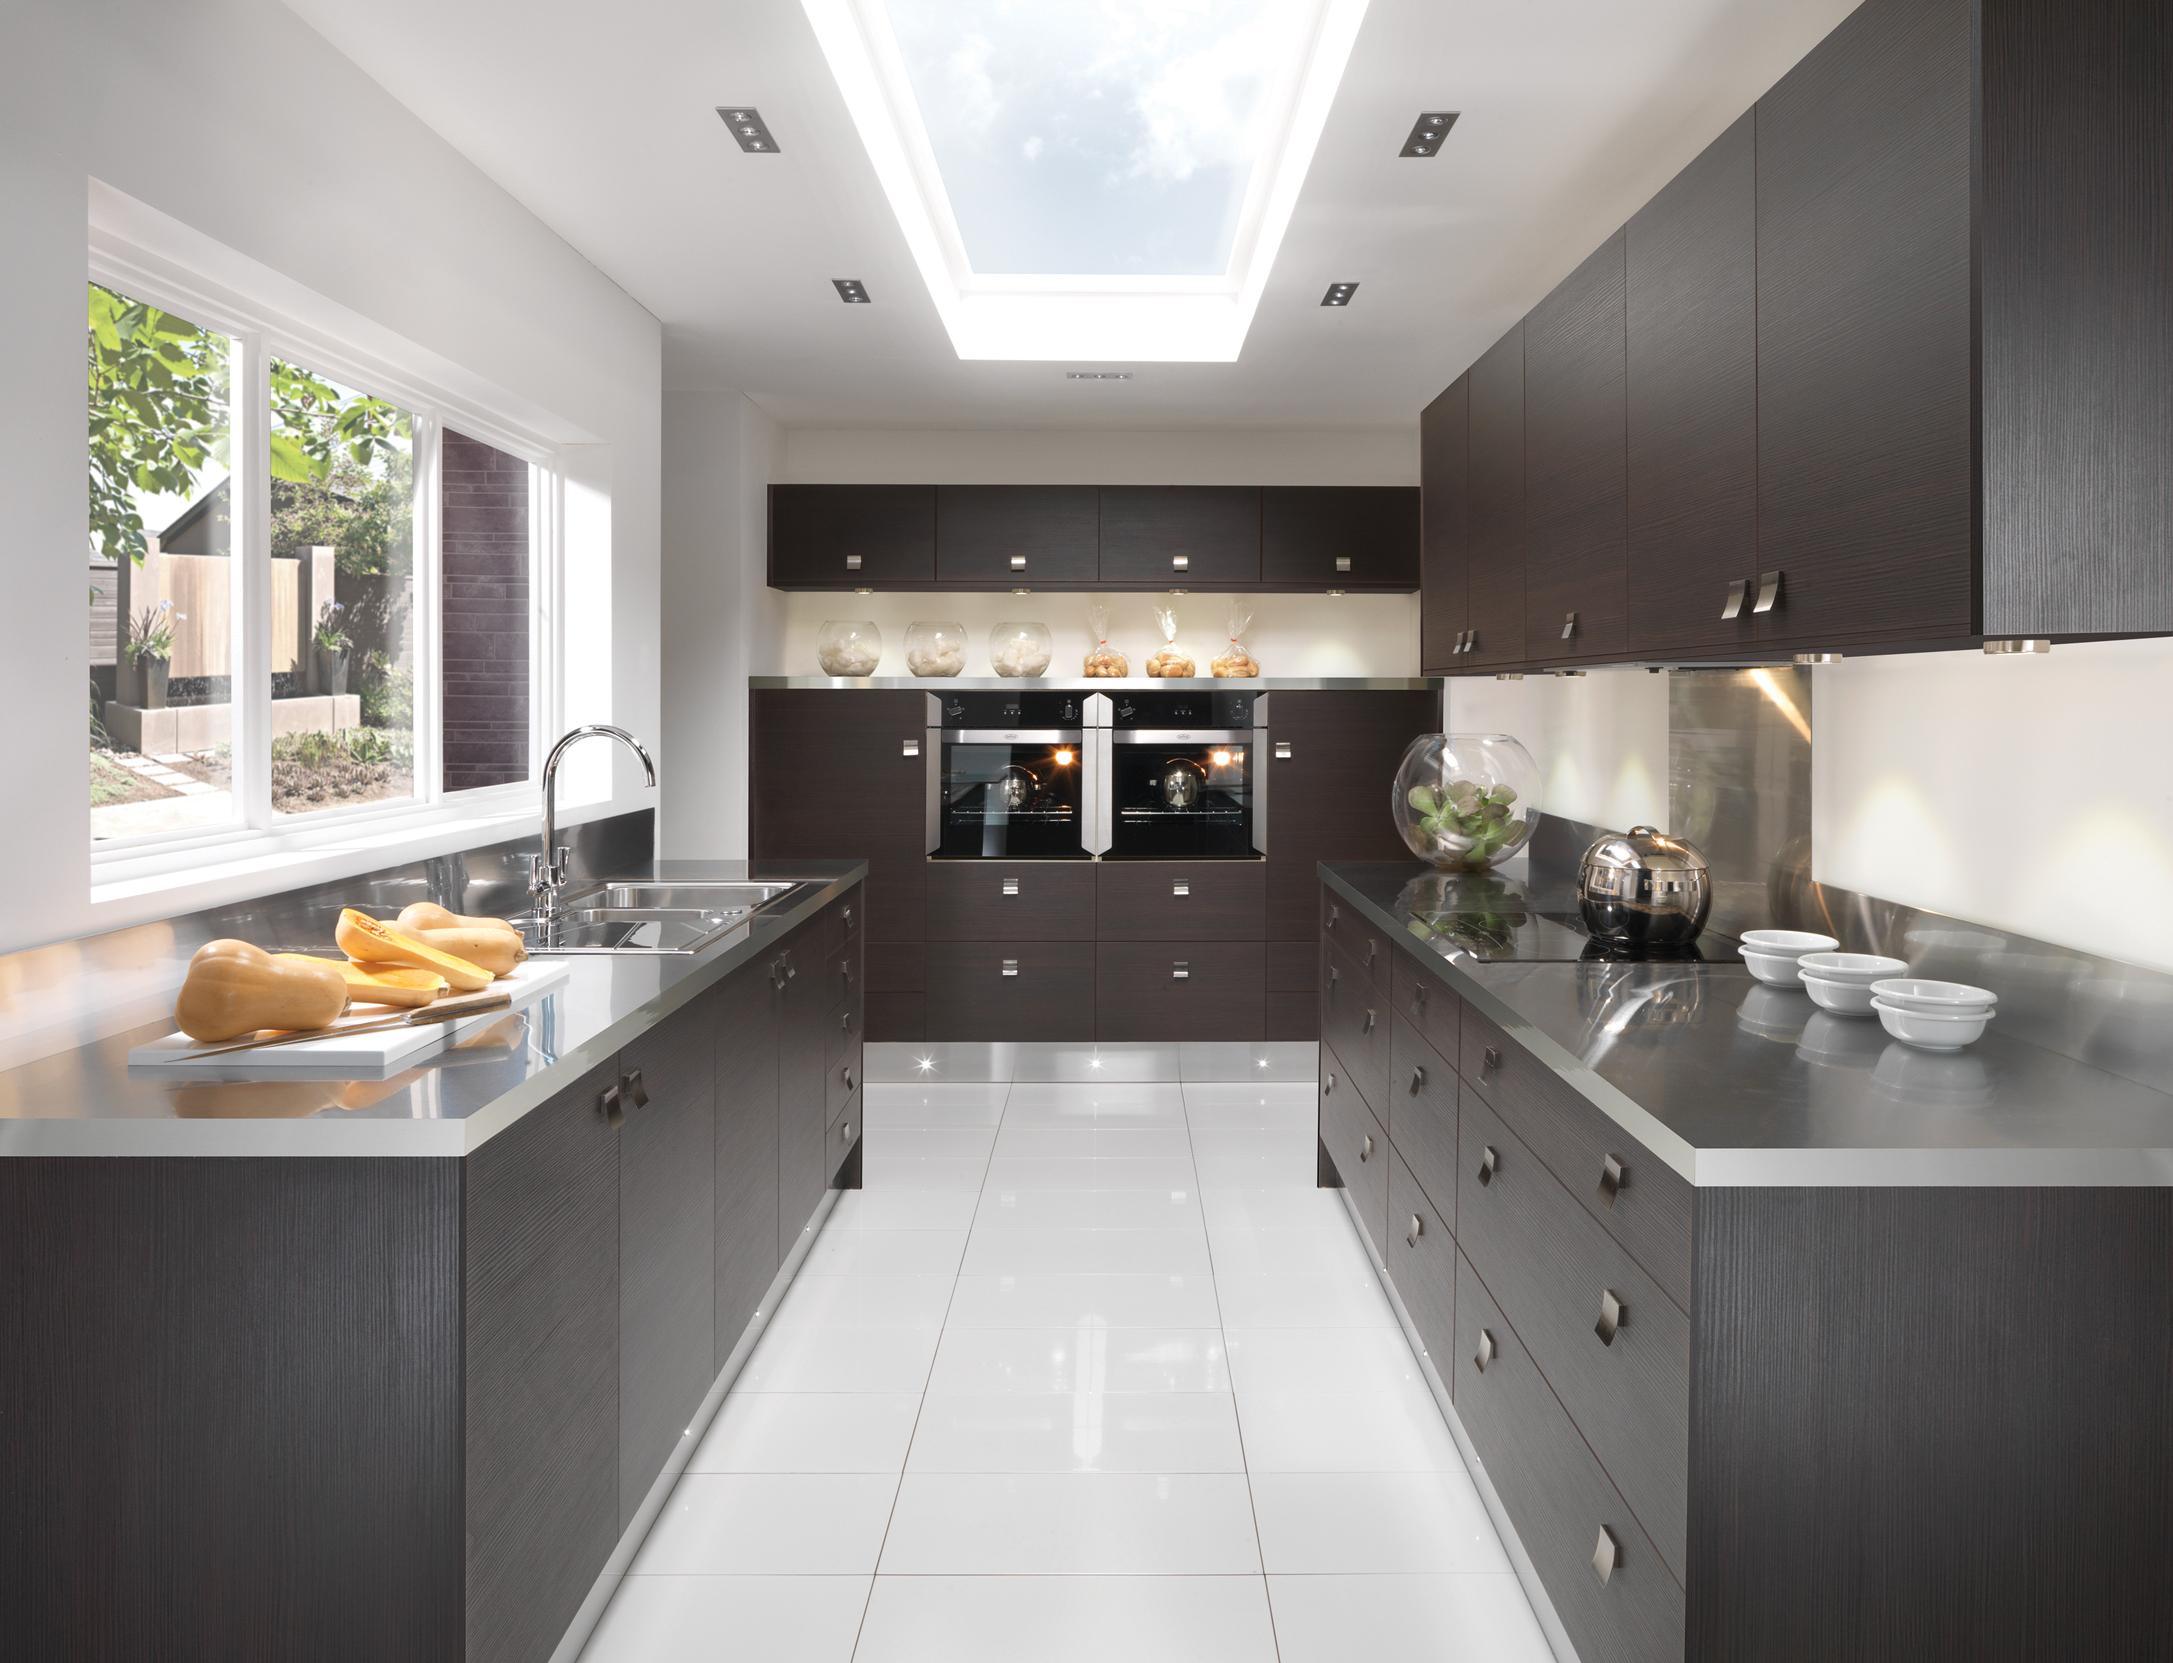 Contemporary kitchen design colchester essex anne for Economic kitchen designs